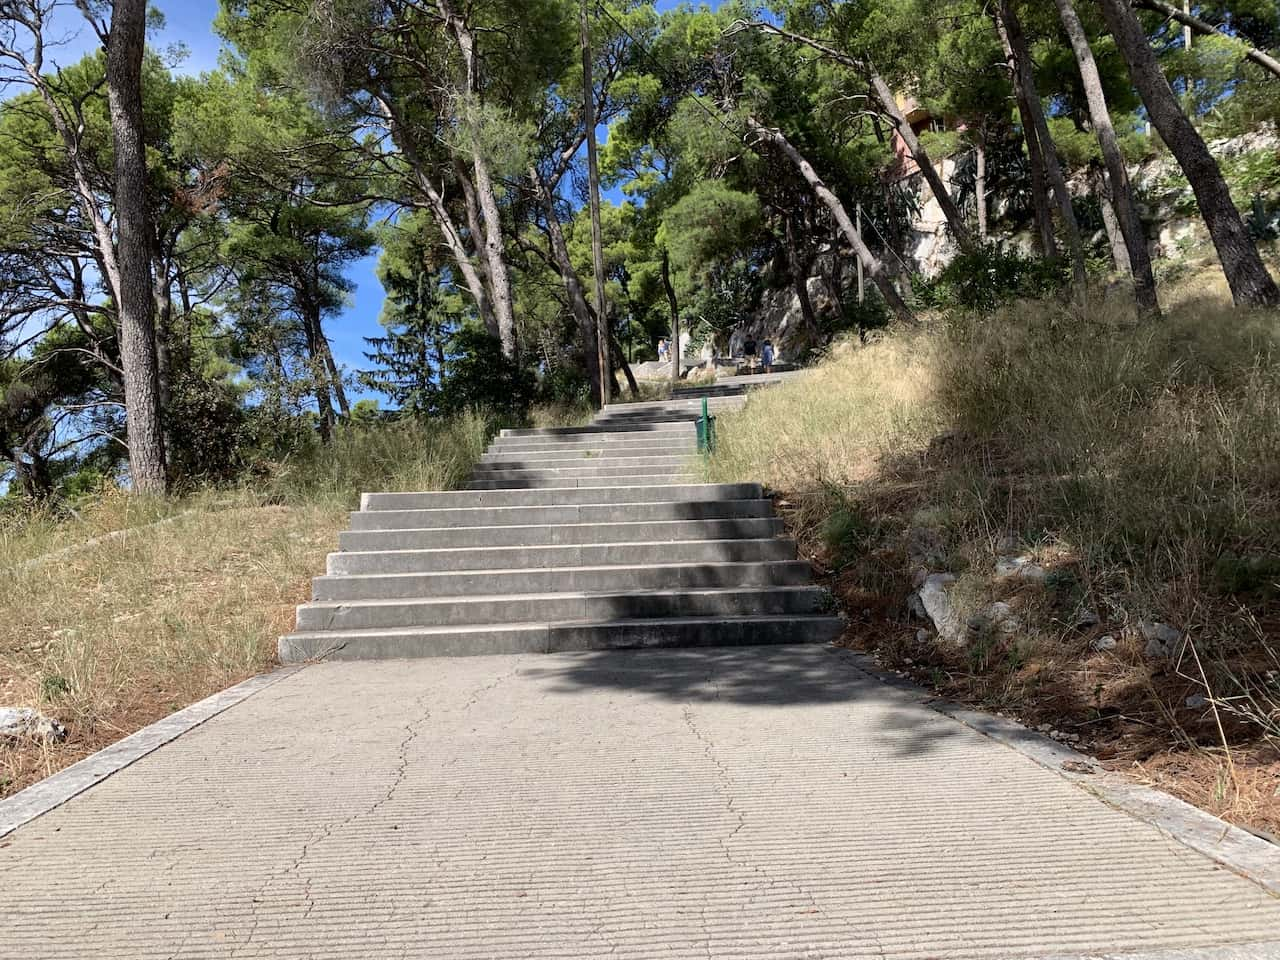 Marjan Hill Stairs